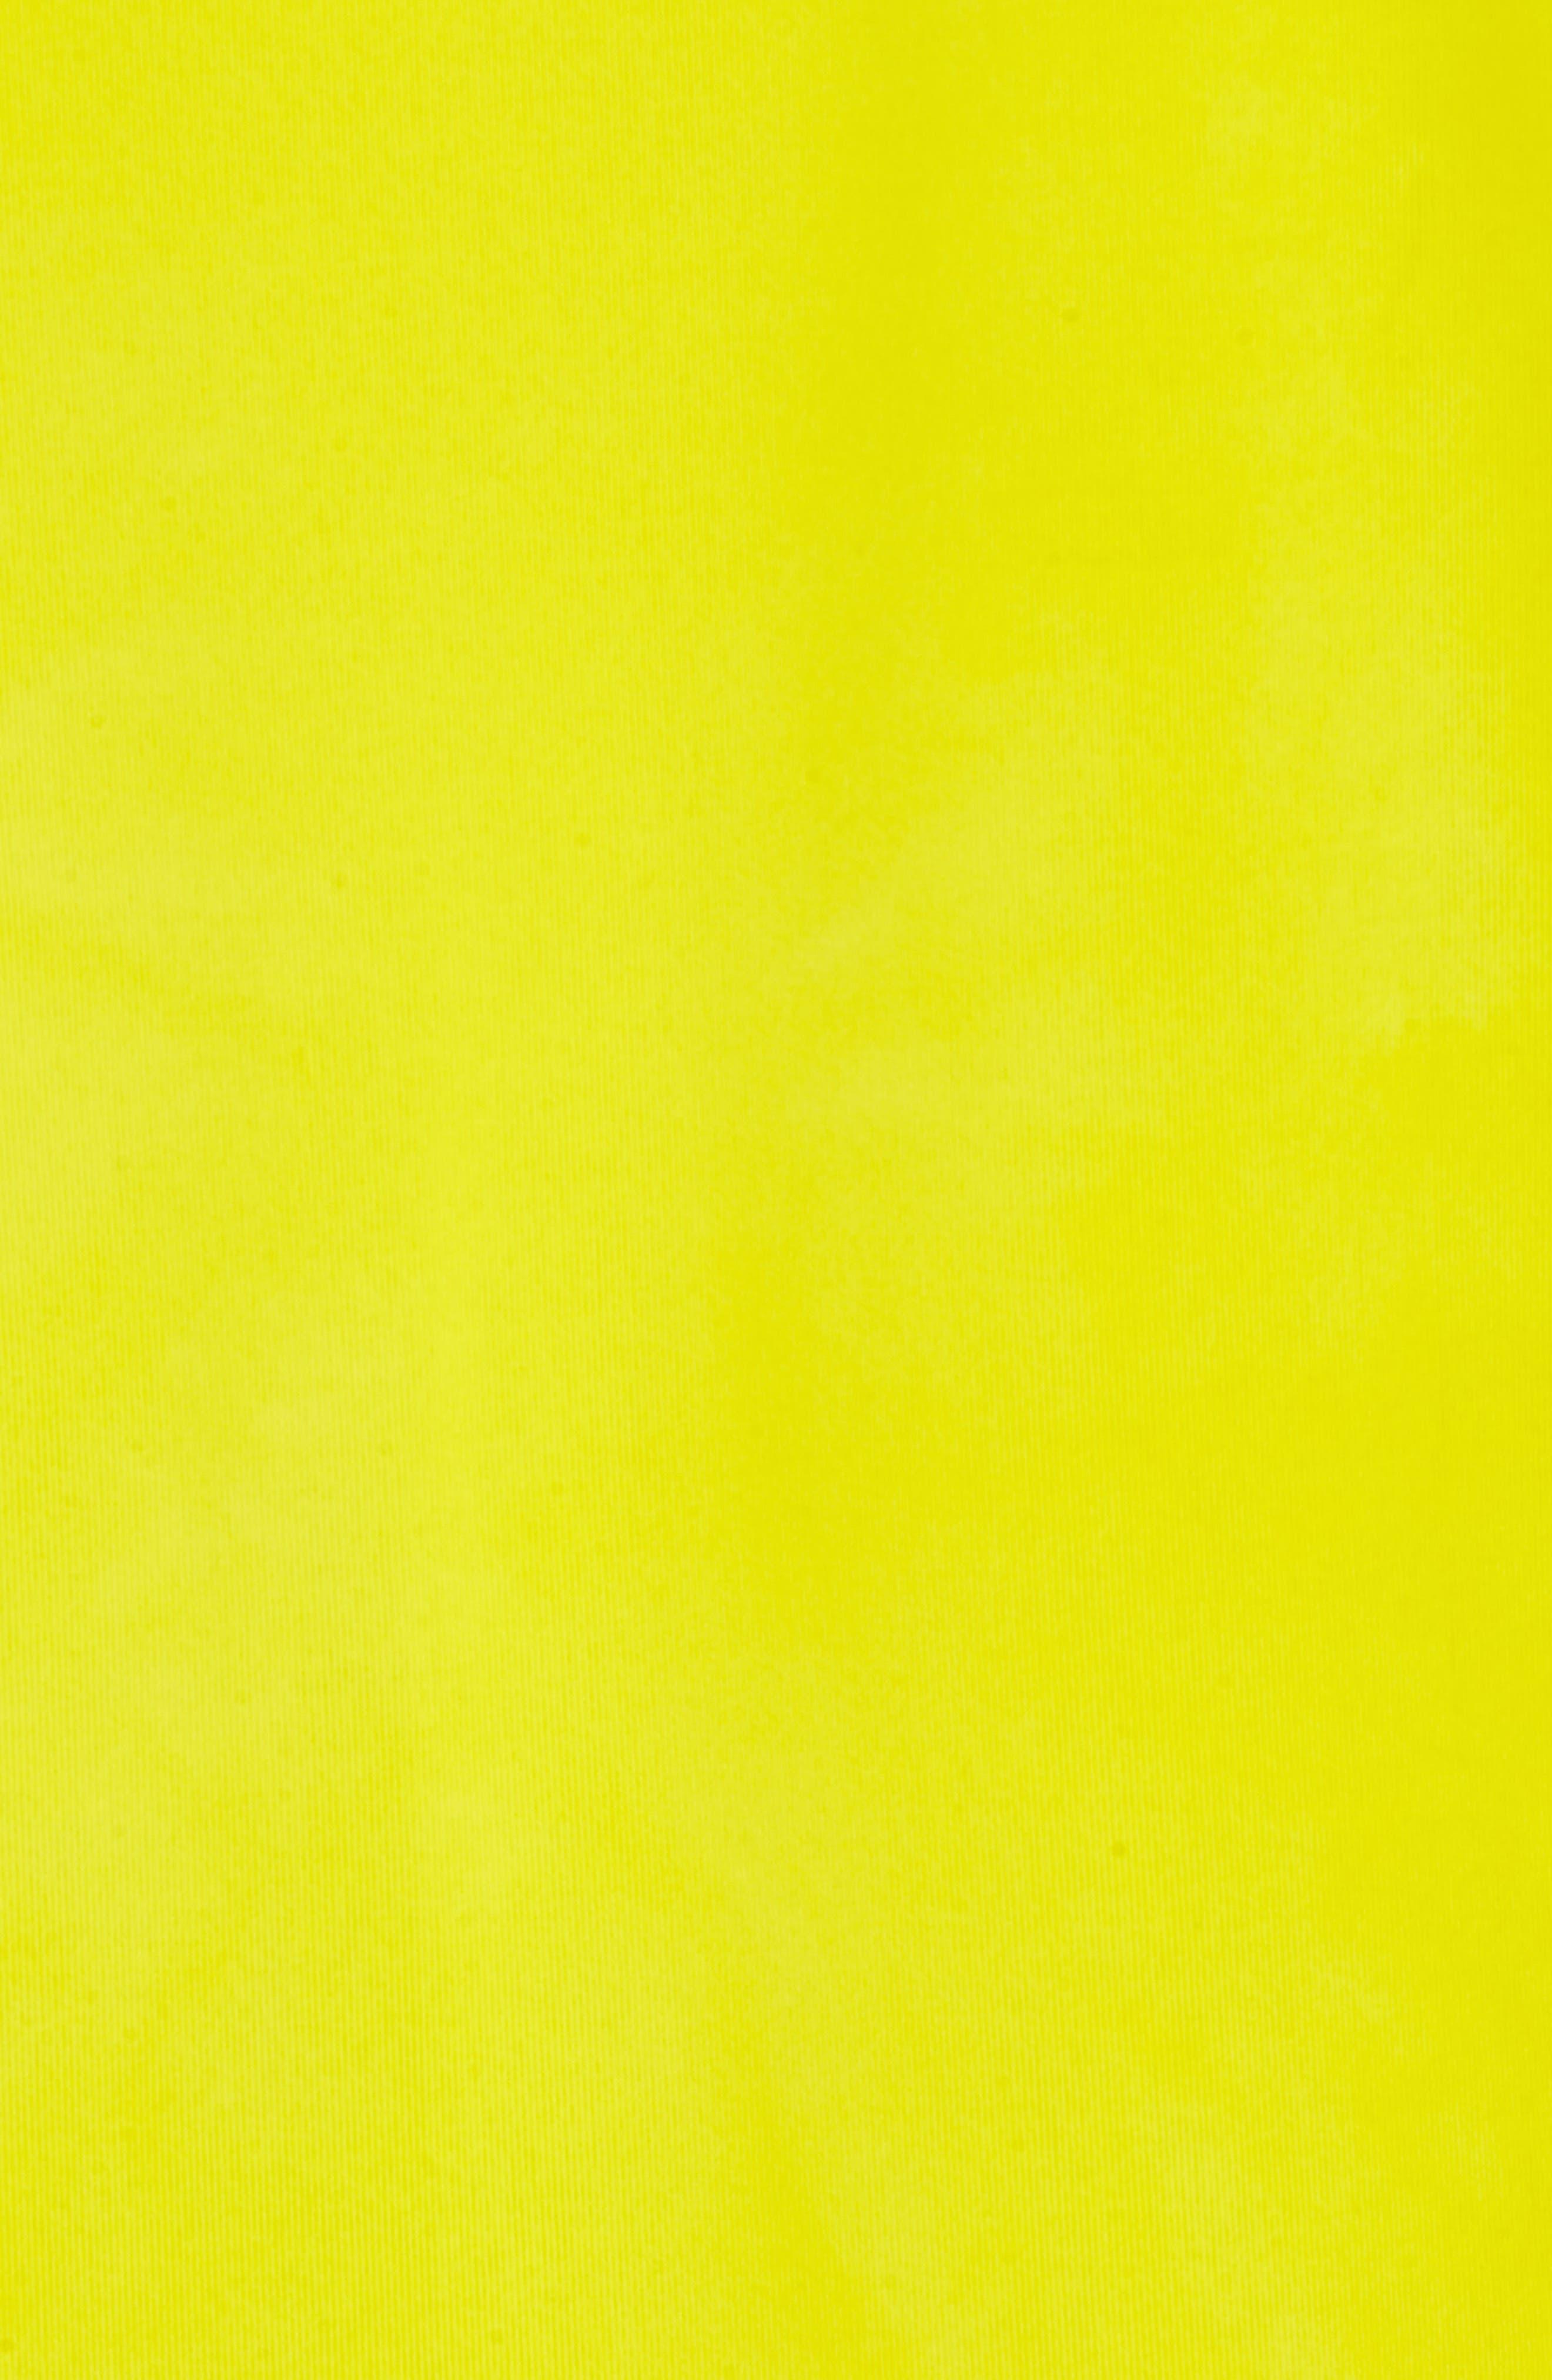 adidas Original Hu Holi T-Shirt,                             Alternate thumbnail 5, color,                             Yellow